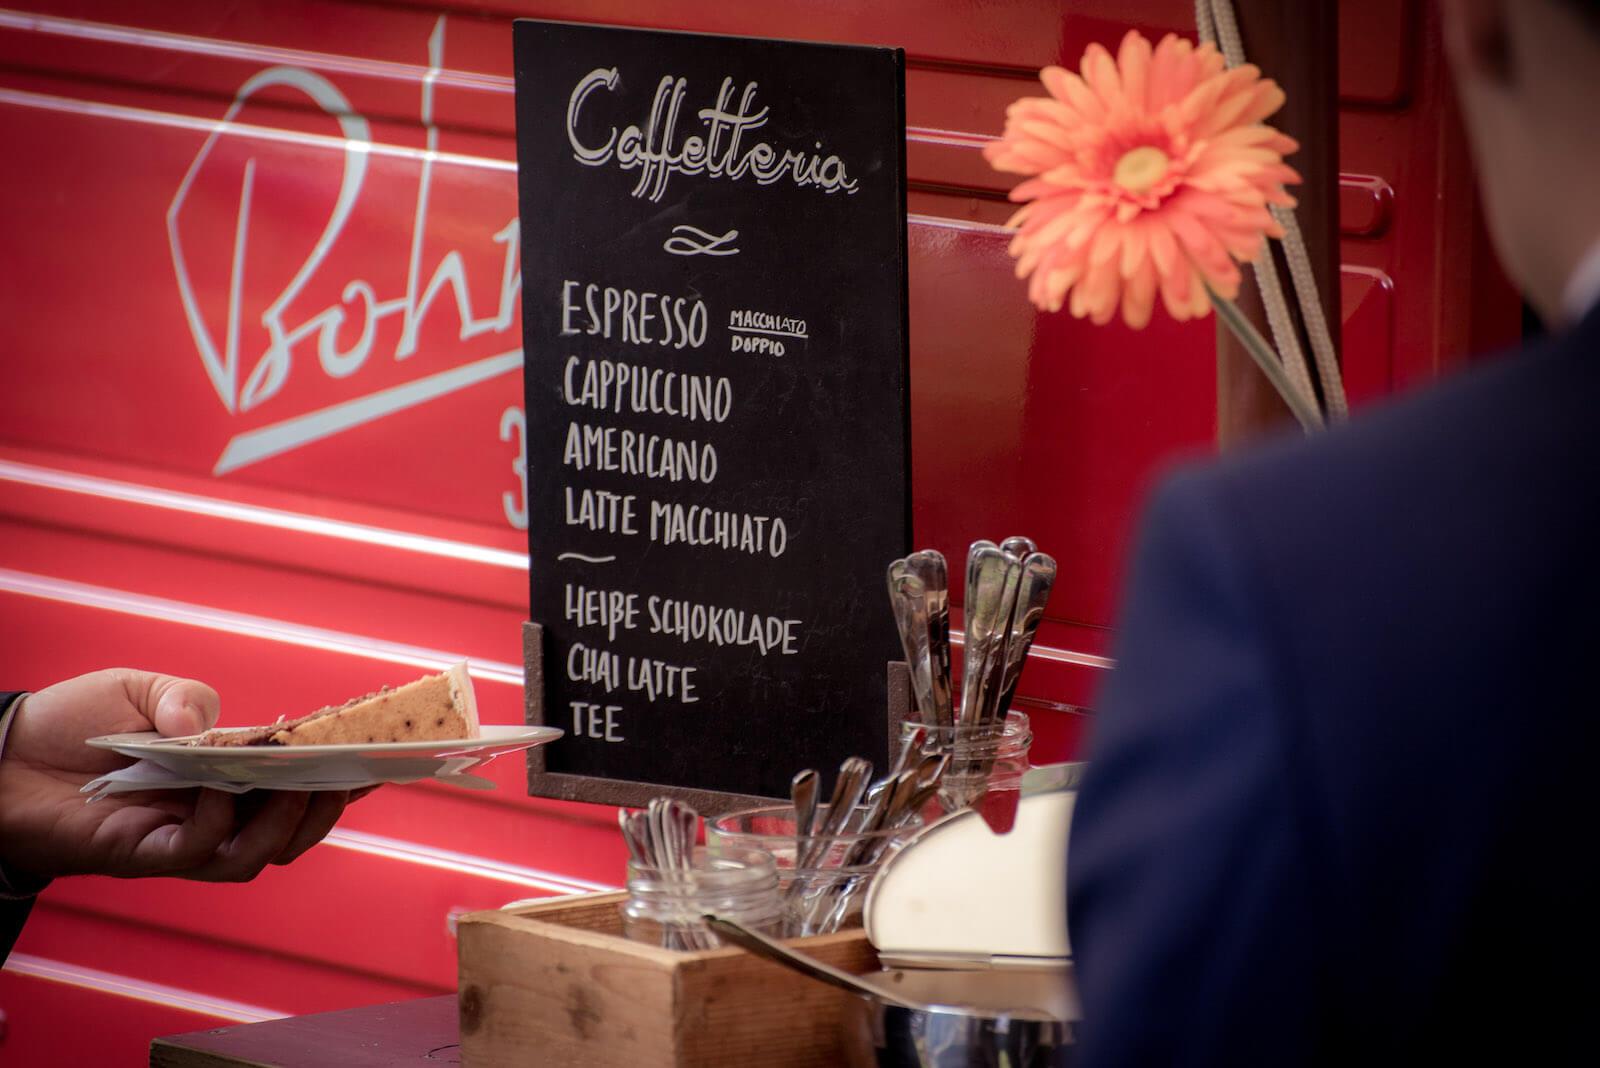 freie Trauung Ammersee - Piaggio Ape mit Caffetteria Bar